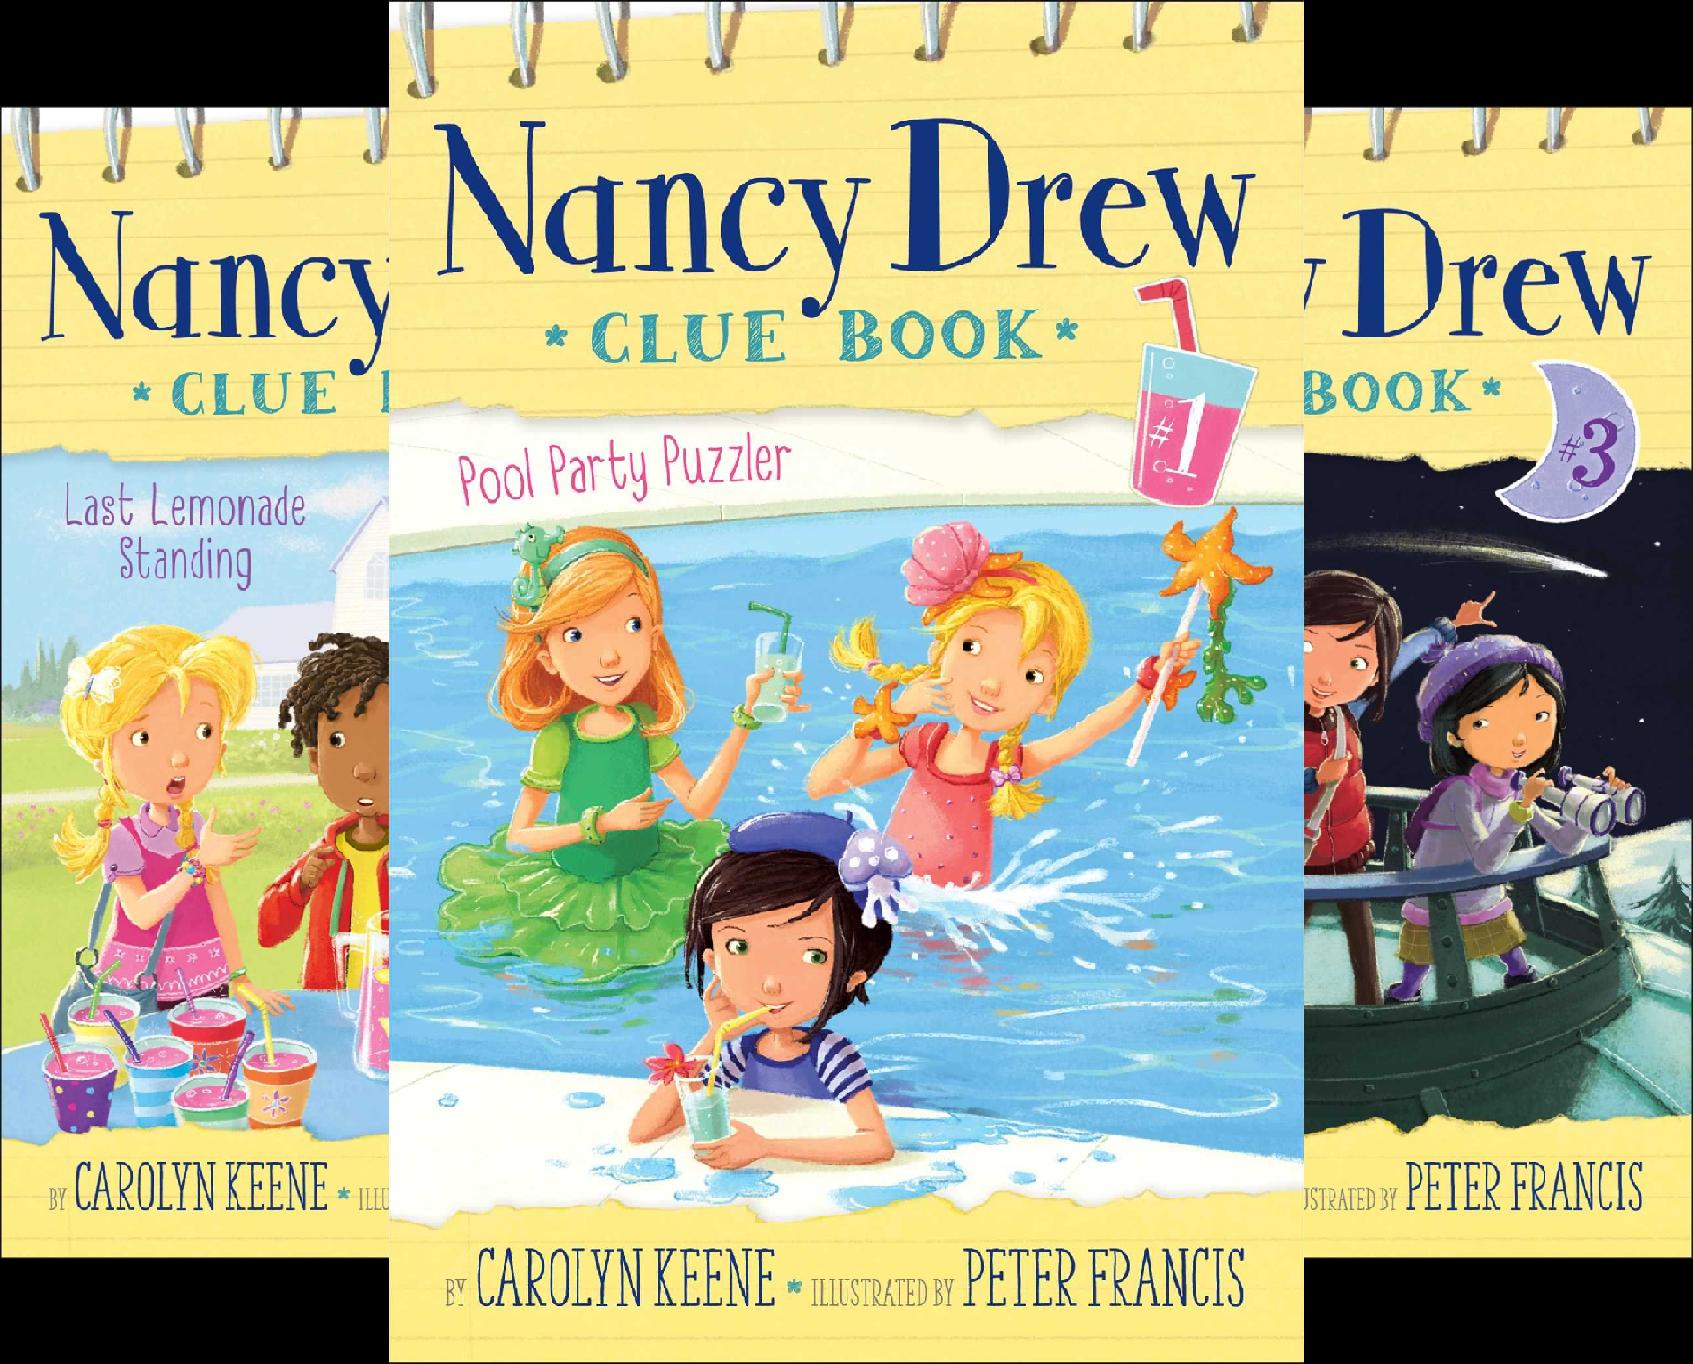 Nancy Drew Clue Book (12 Book Series)